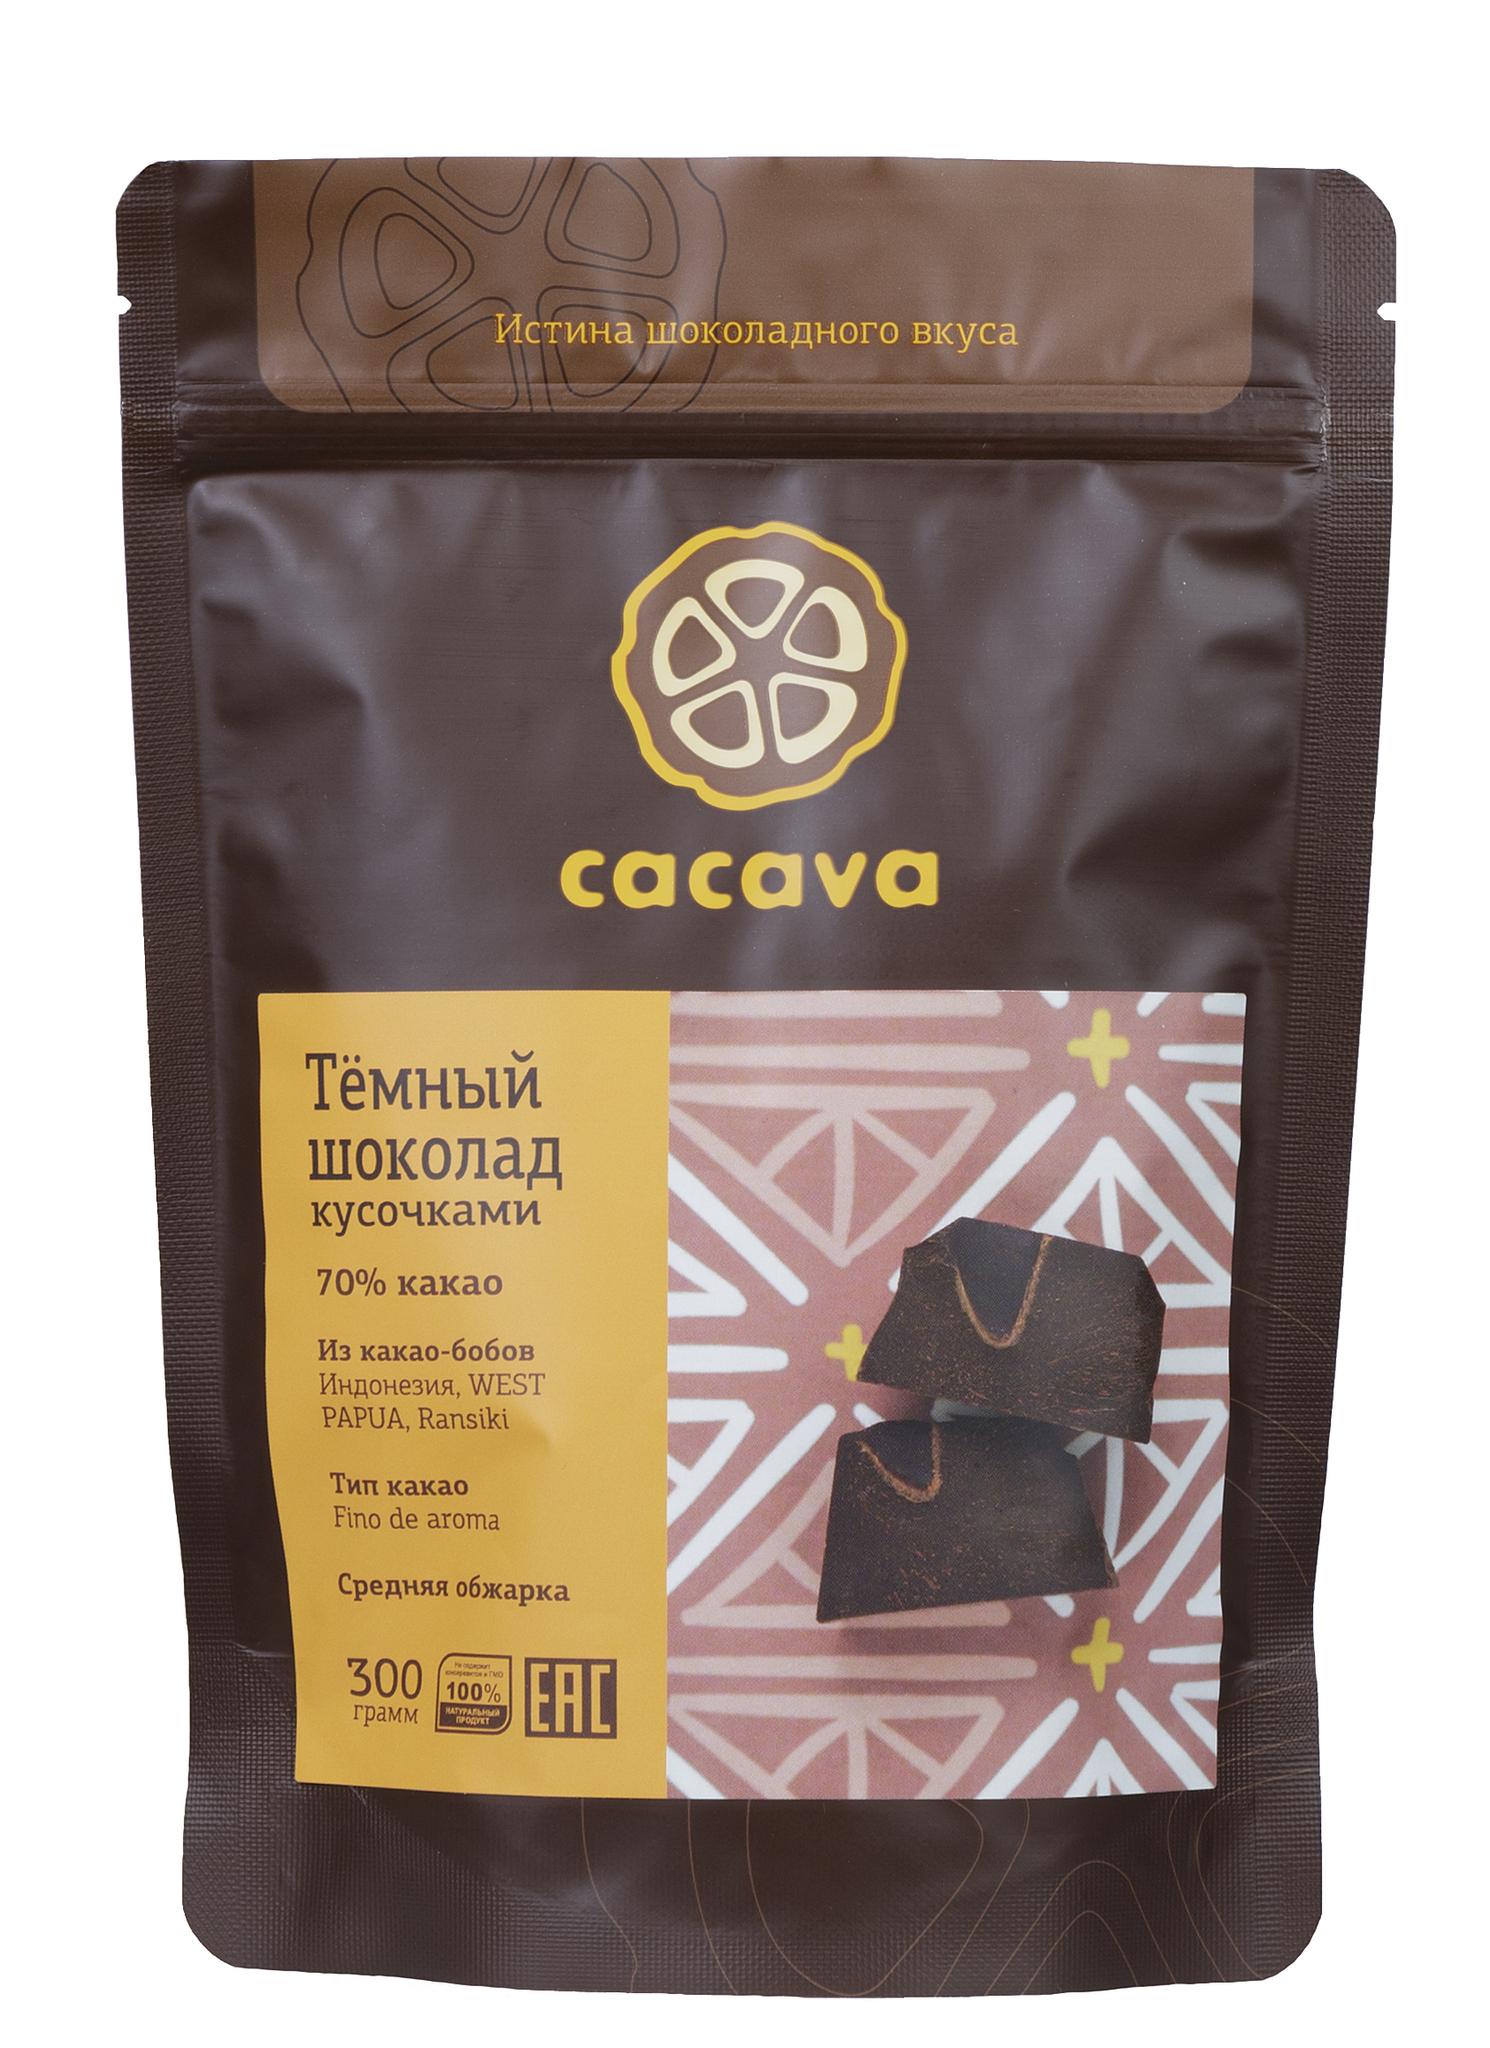 Тёмный шоколад 70 % какао (Индонезия, WEST PAPUA, Ransiki), упаковка 300 грамм